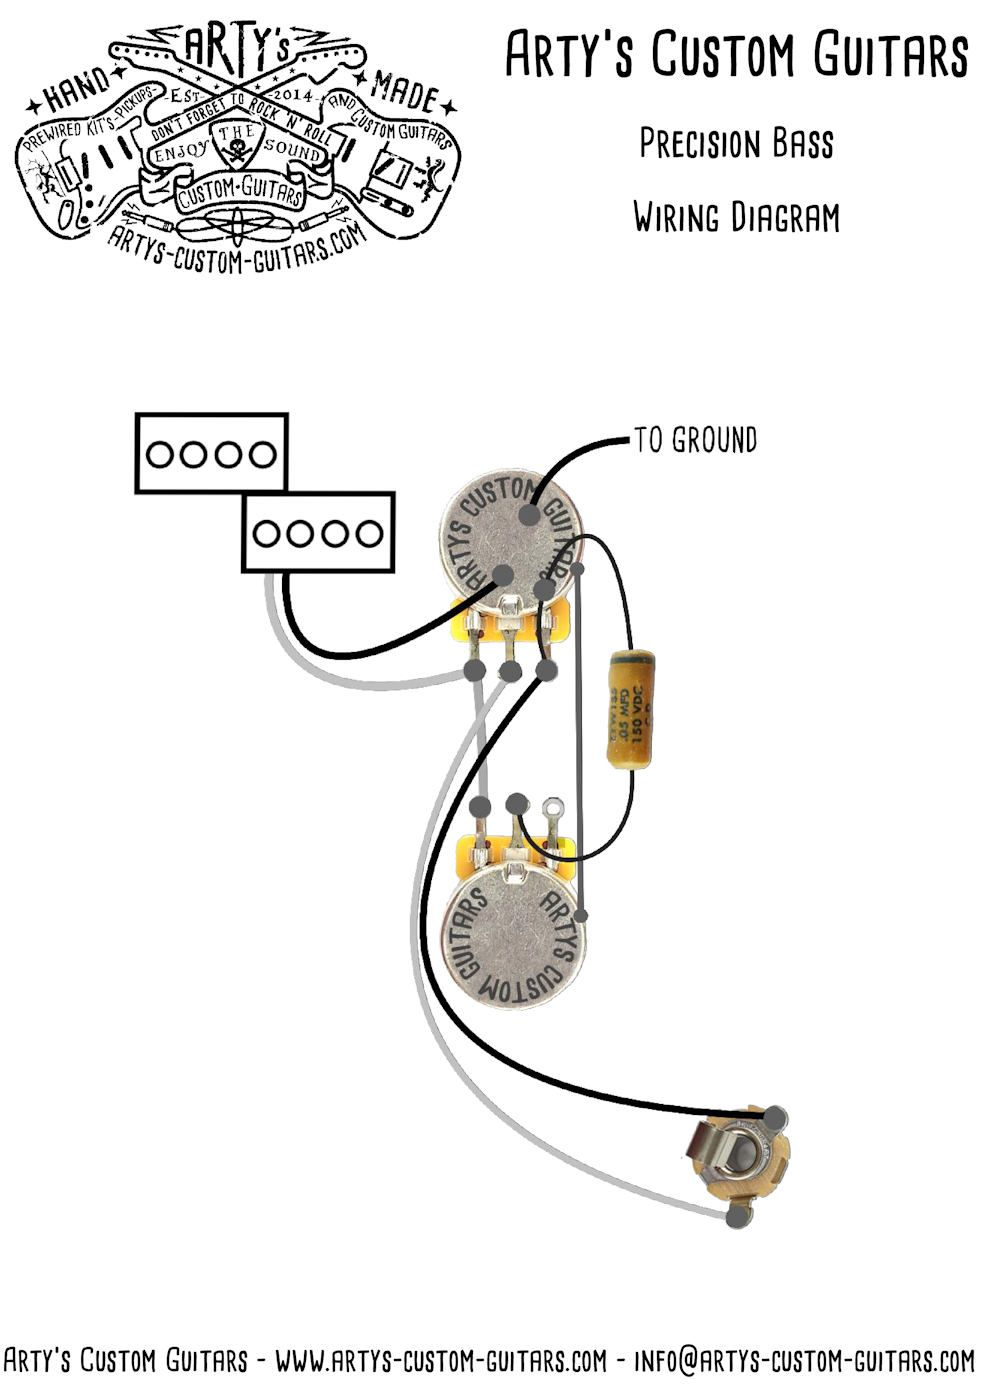 hight resolution of precision bass wiring diagram arty s custom guitars